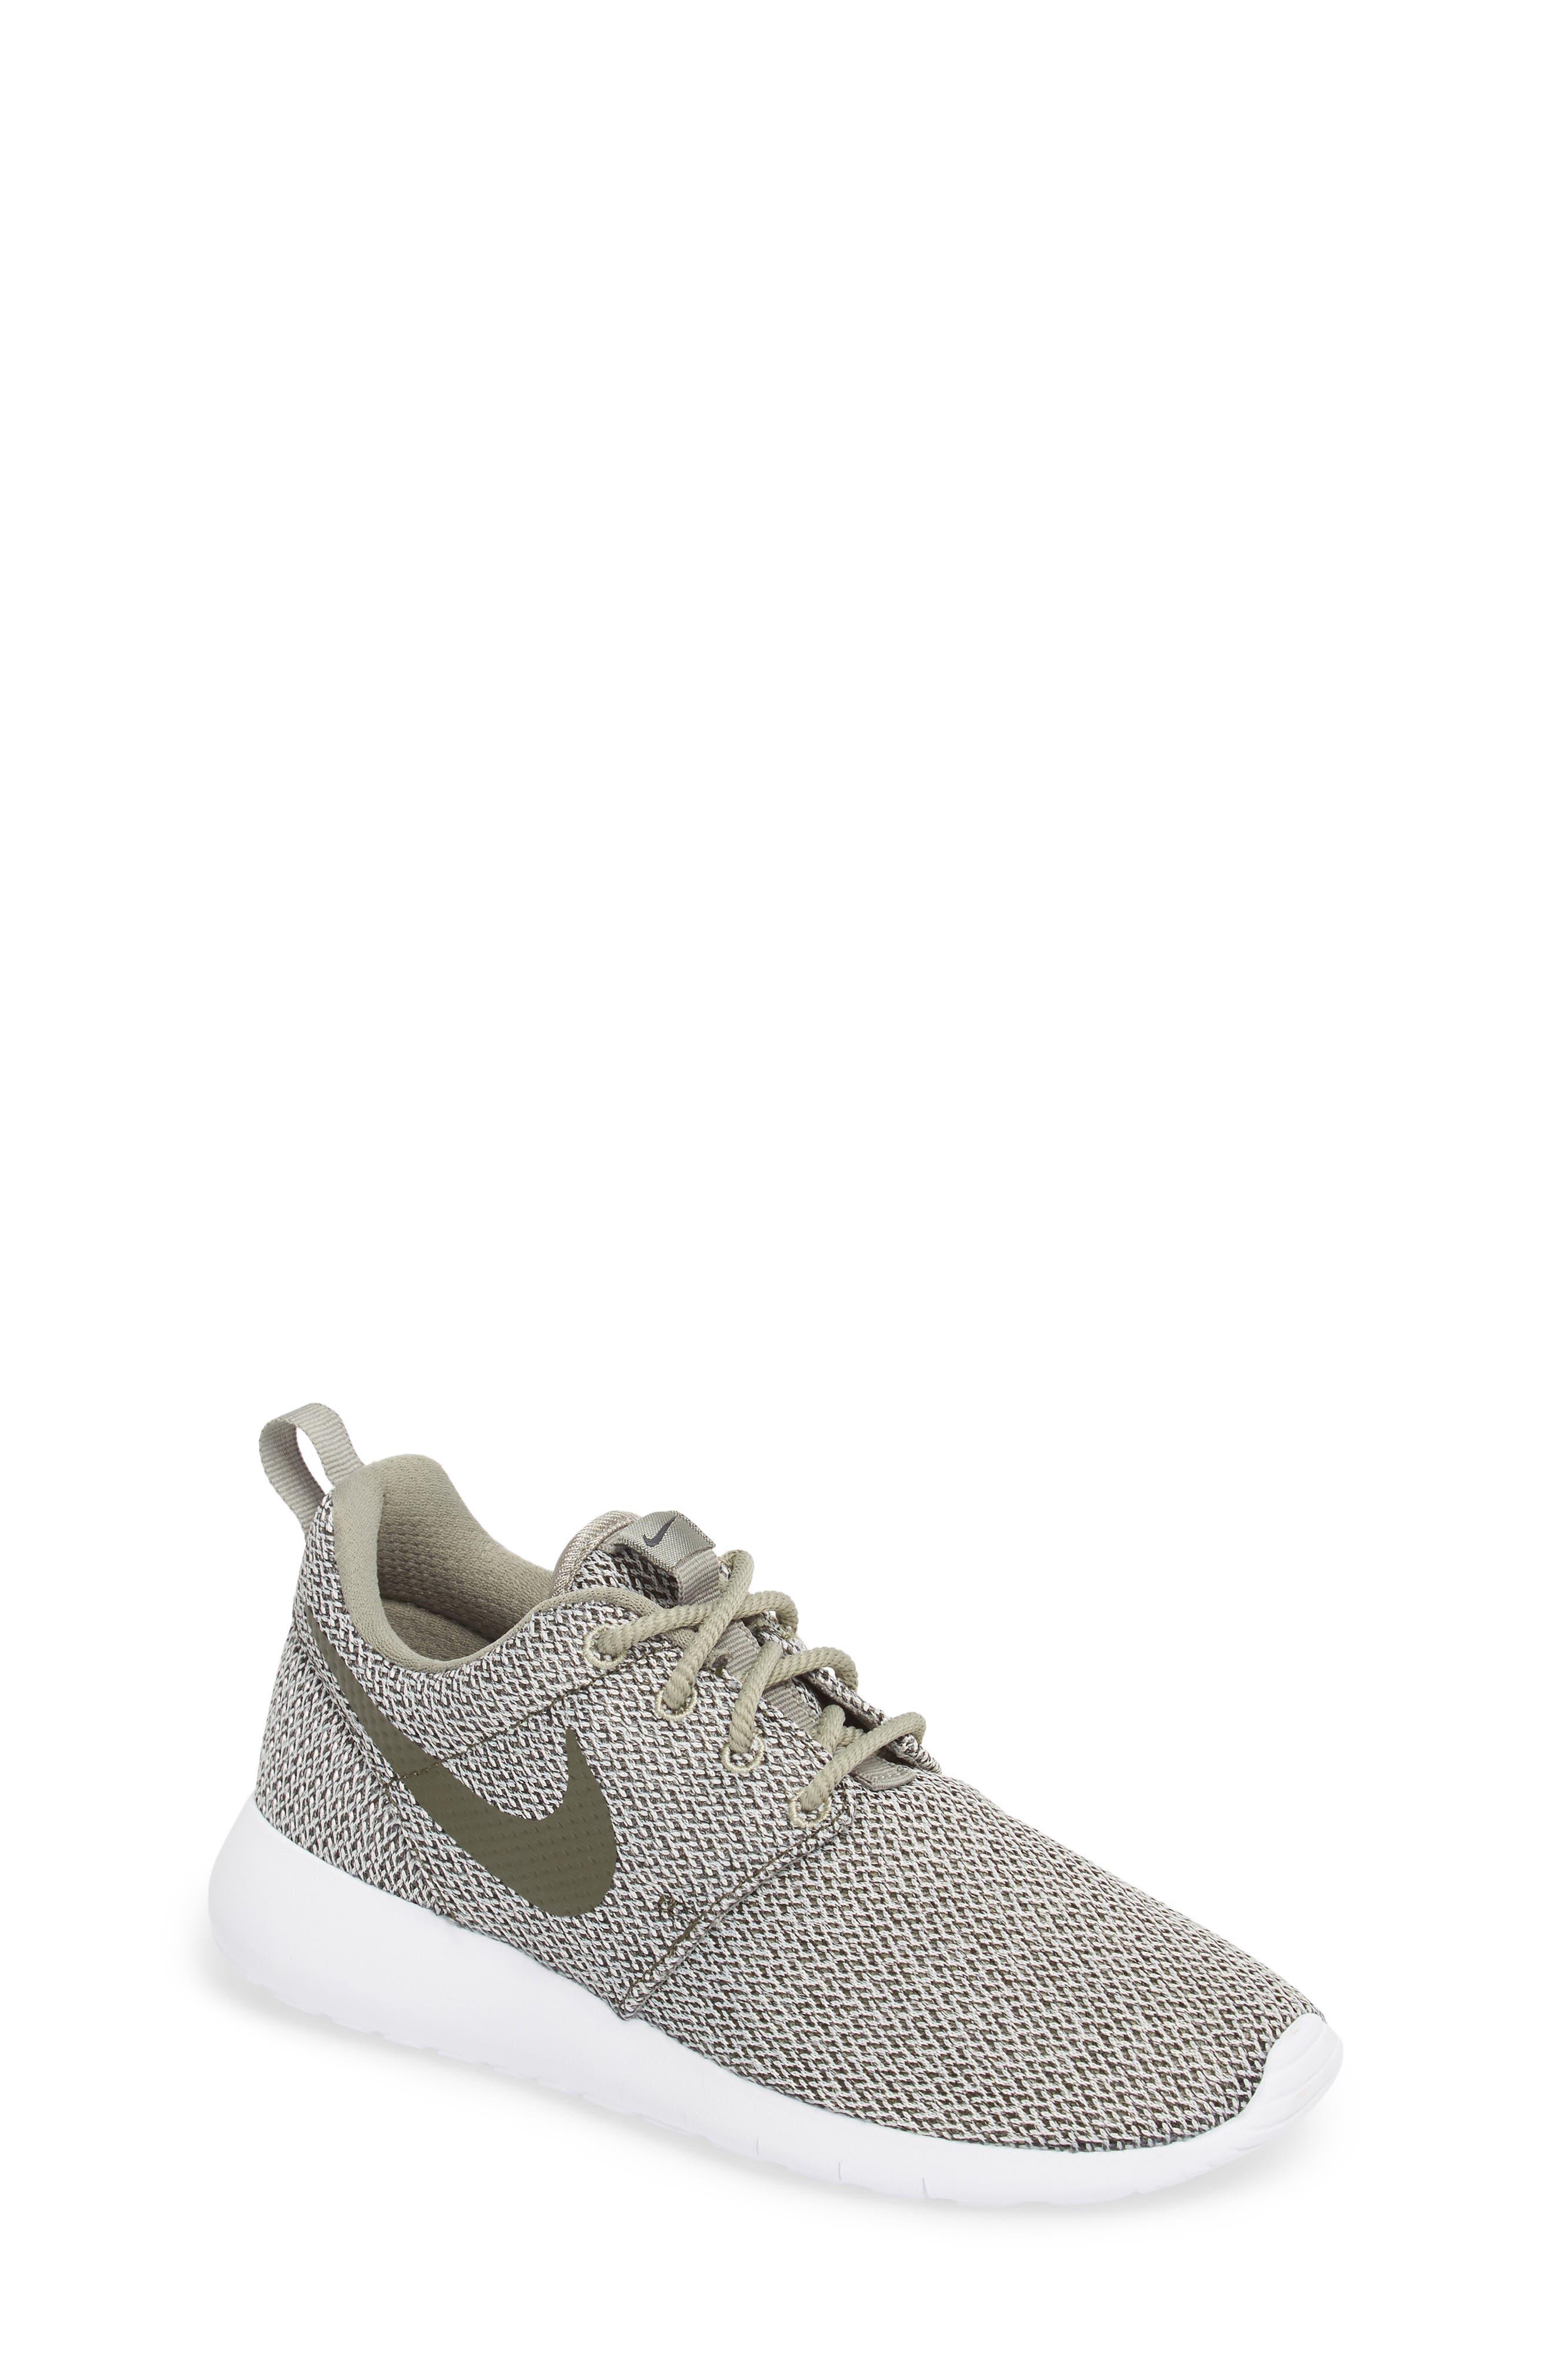 'Roshe Run' Sneaker,                         Main,                         color, Dark Stucco/ Sequoia/ Bone